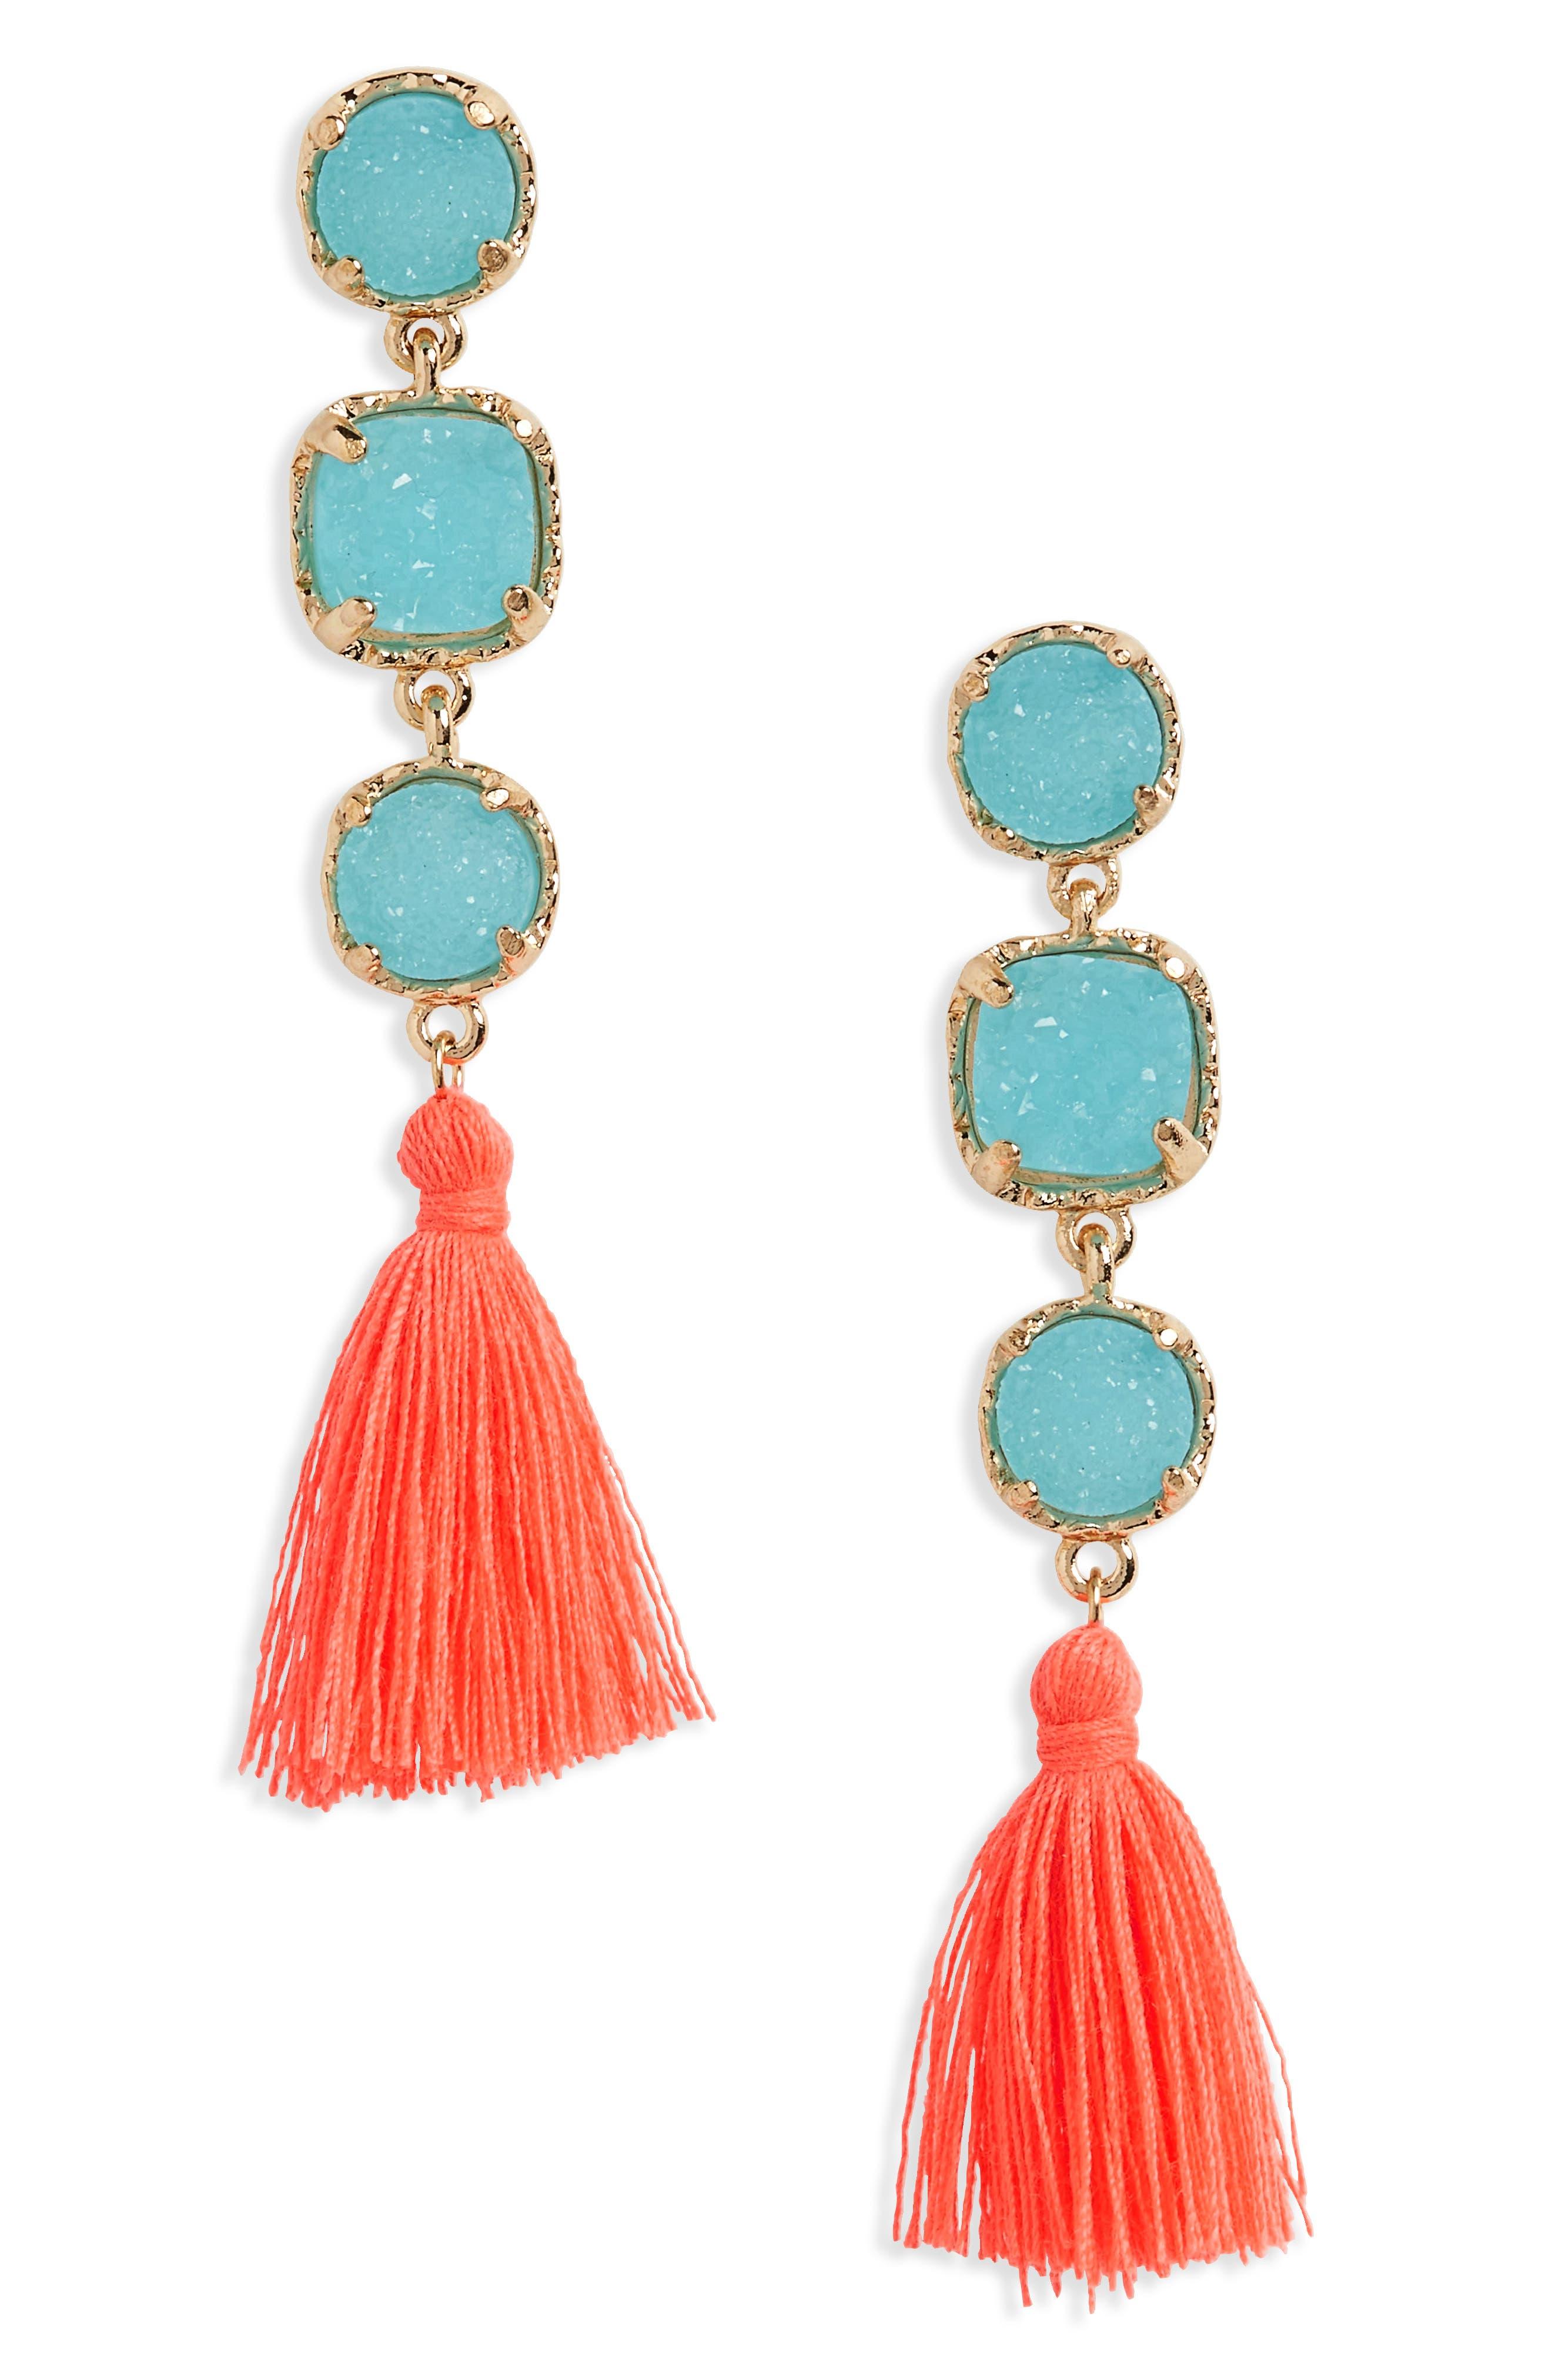 Drusy Tassel Earrings,                             Main thumbnail 1, color,                             Turq